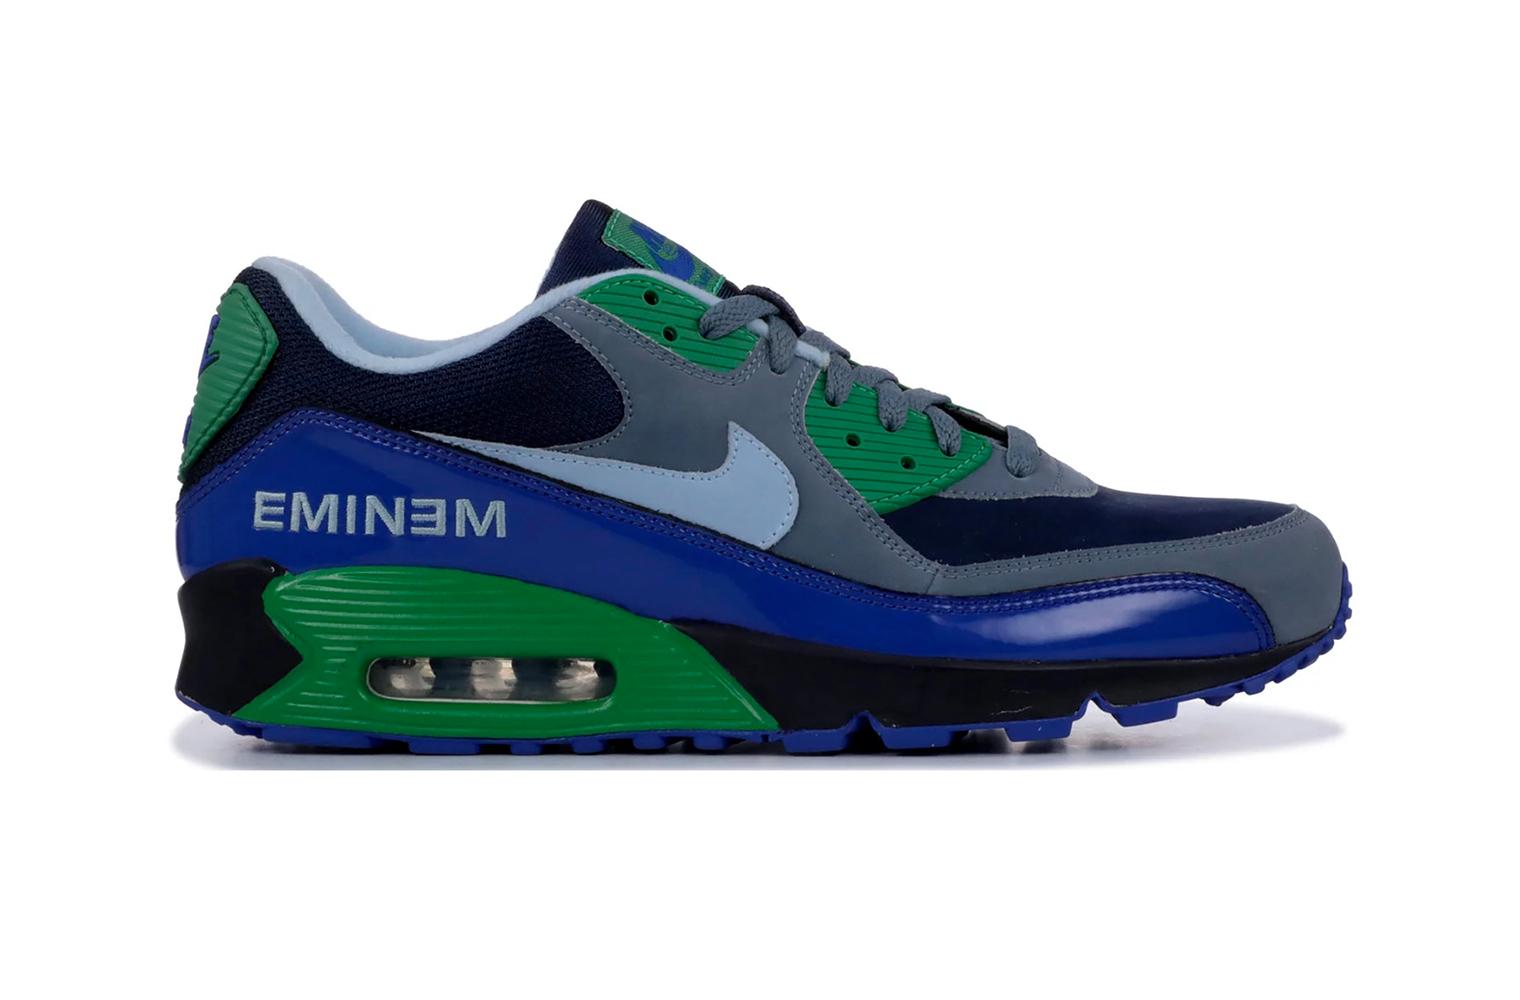 Eminem x Nike Air Max 90 «Charity Series», 2006